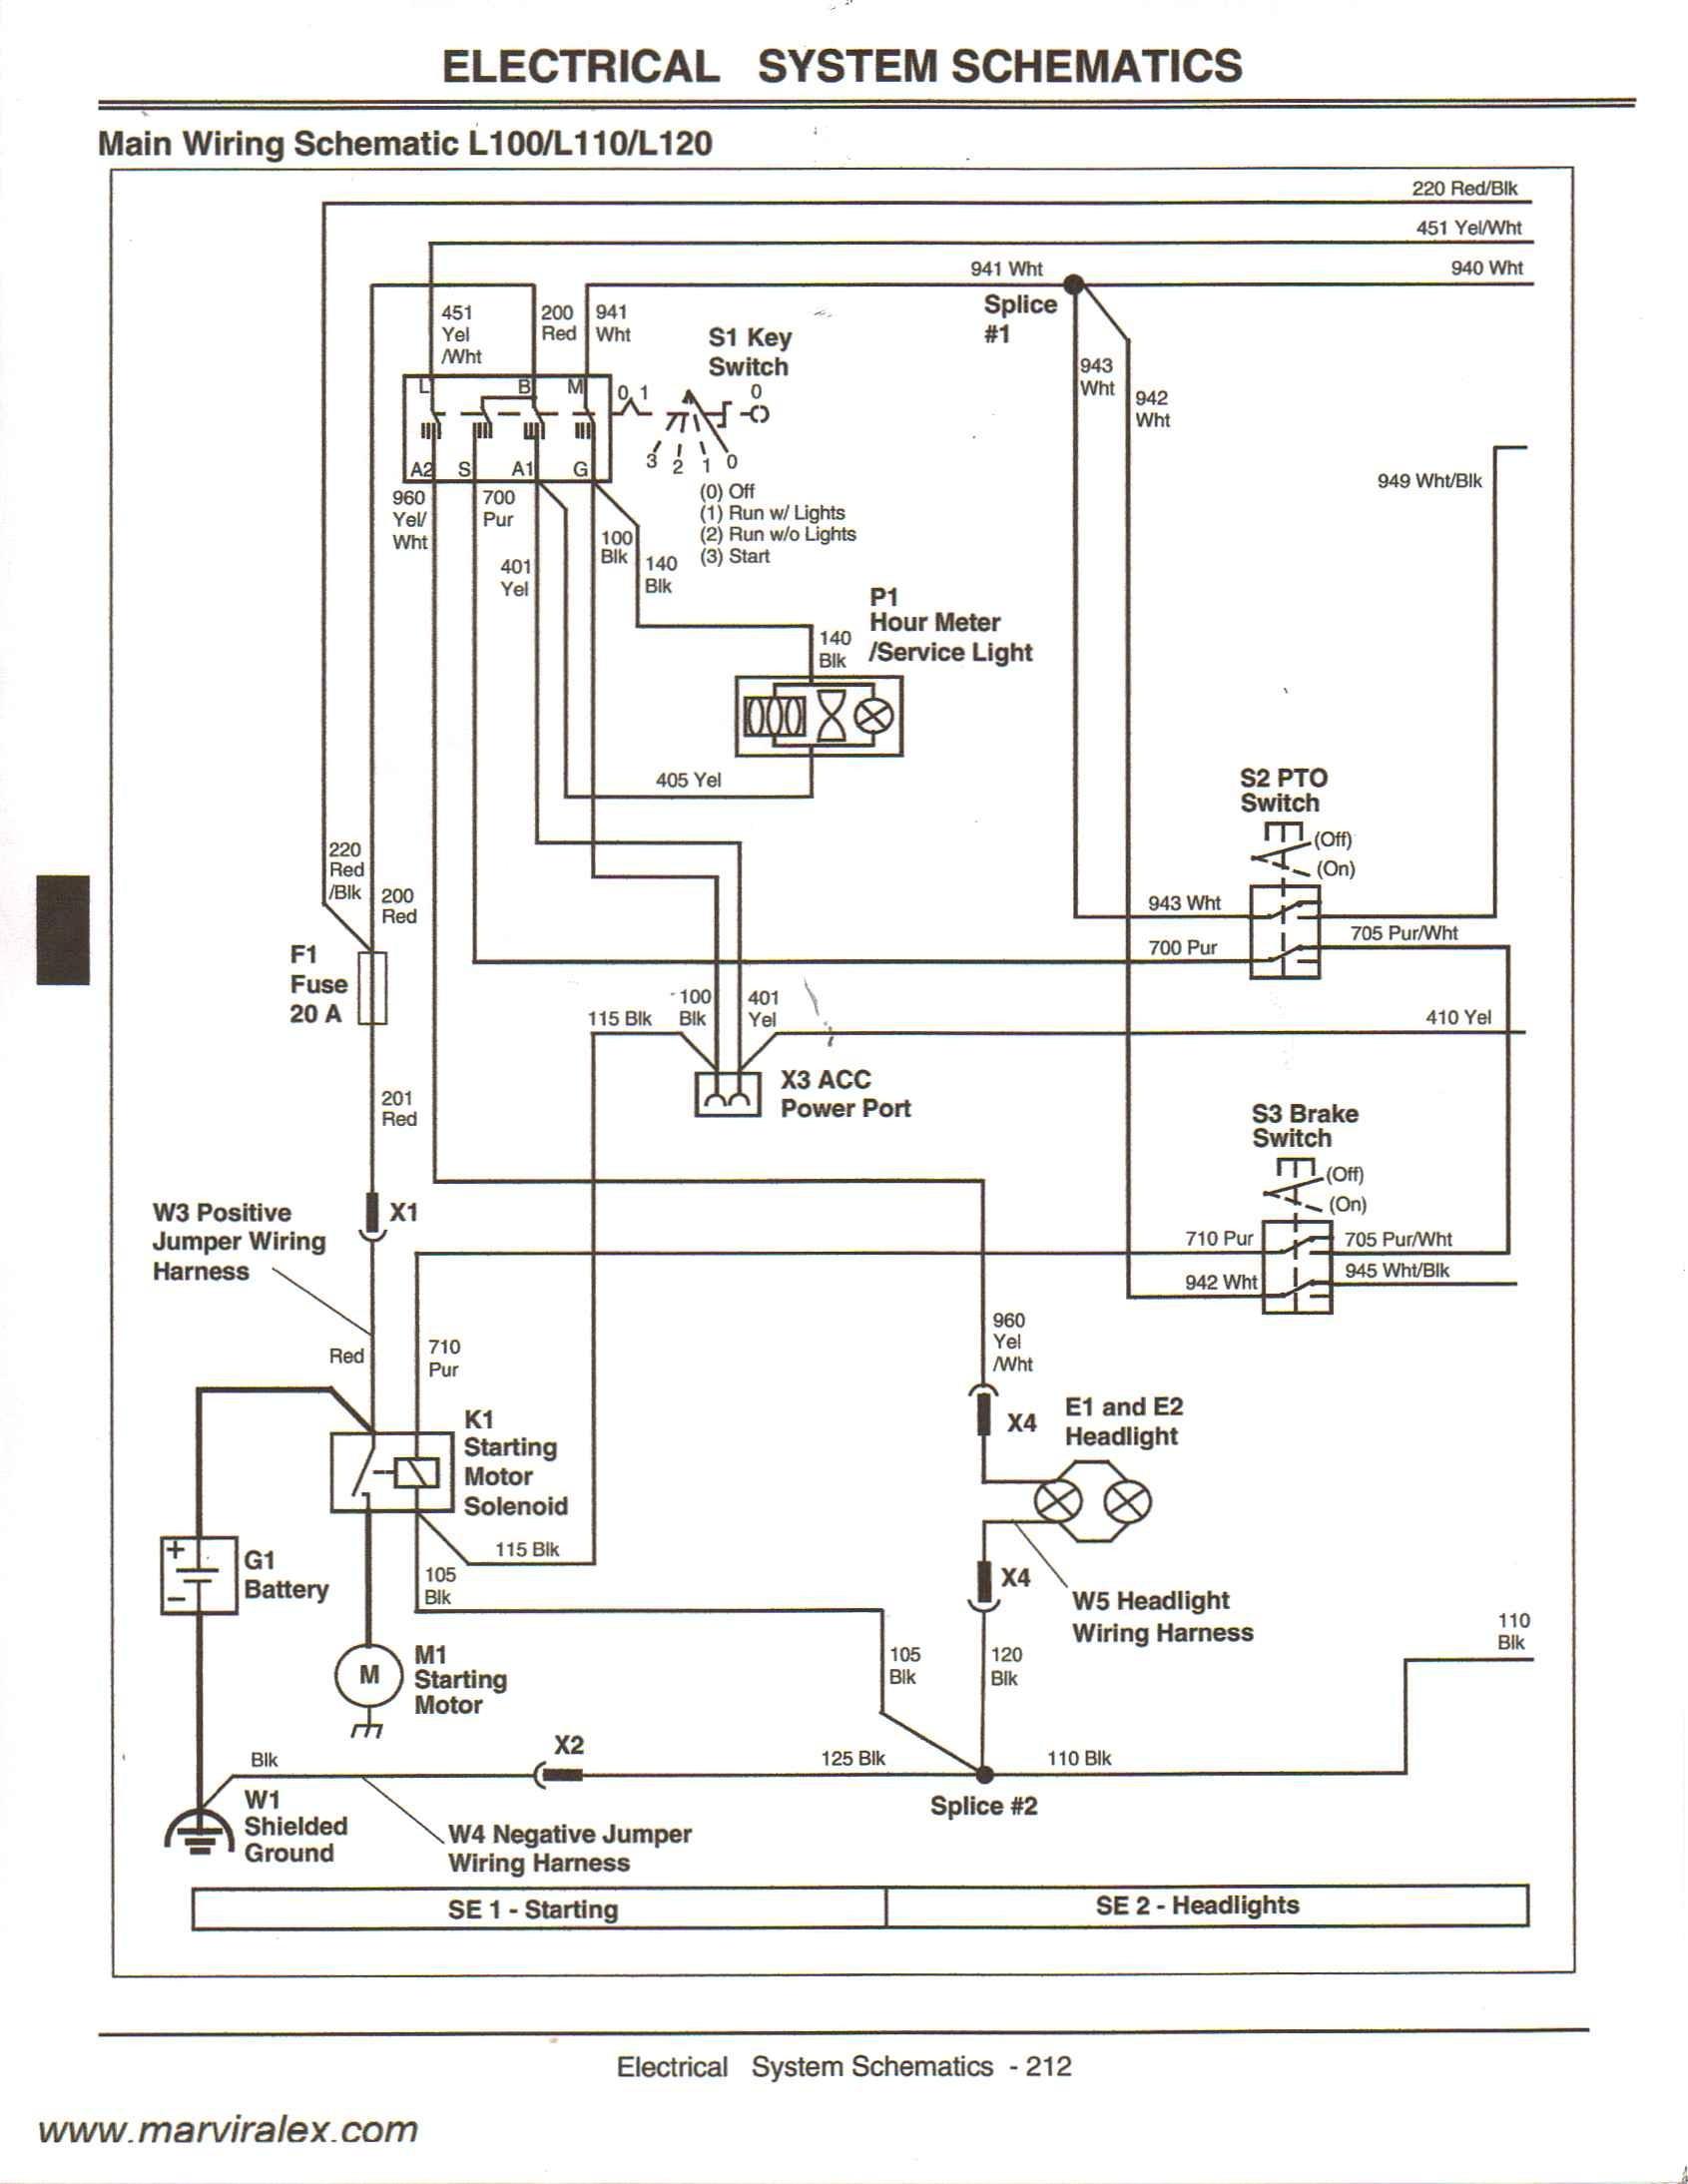 John Deere 160 Wiring Harness - Wiring Diagram SchemesWiring Diagram Schemes - Mein-Raetien